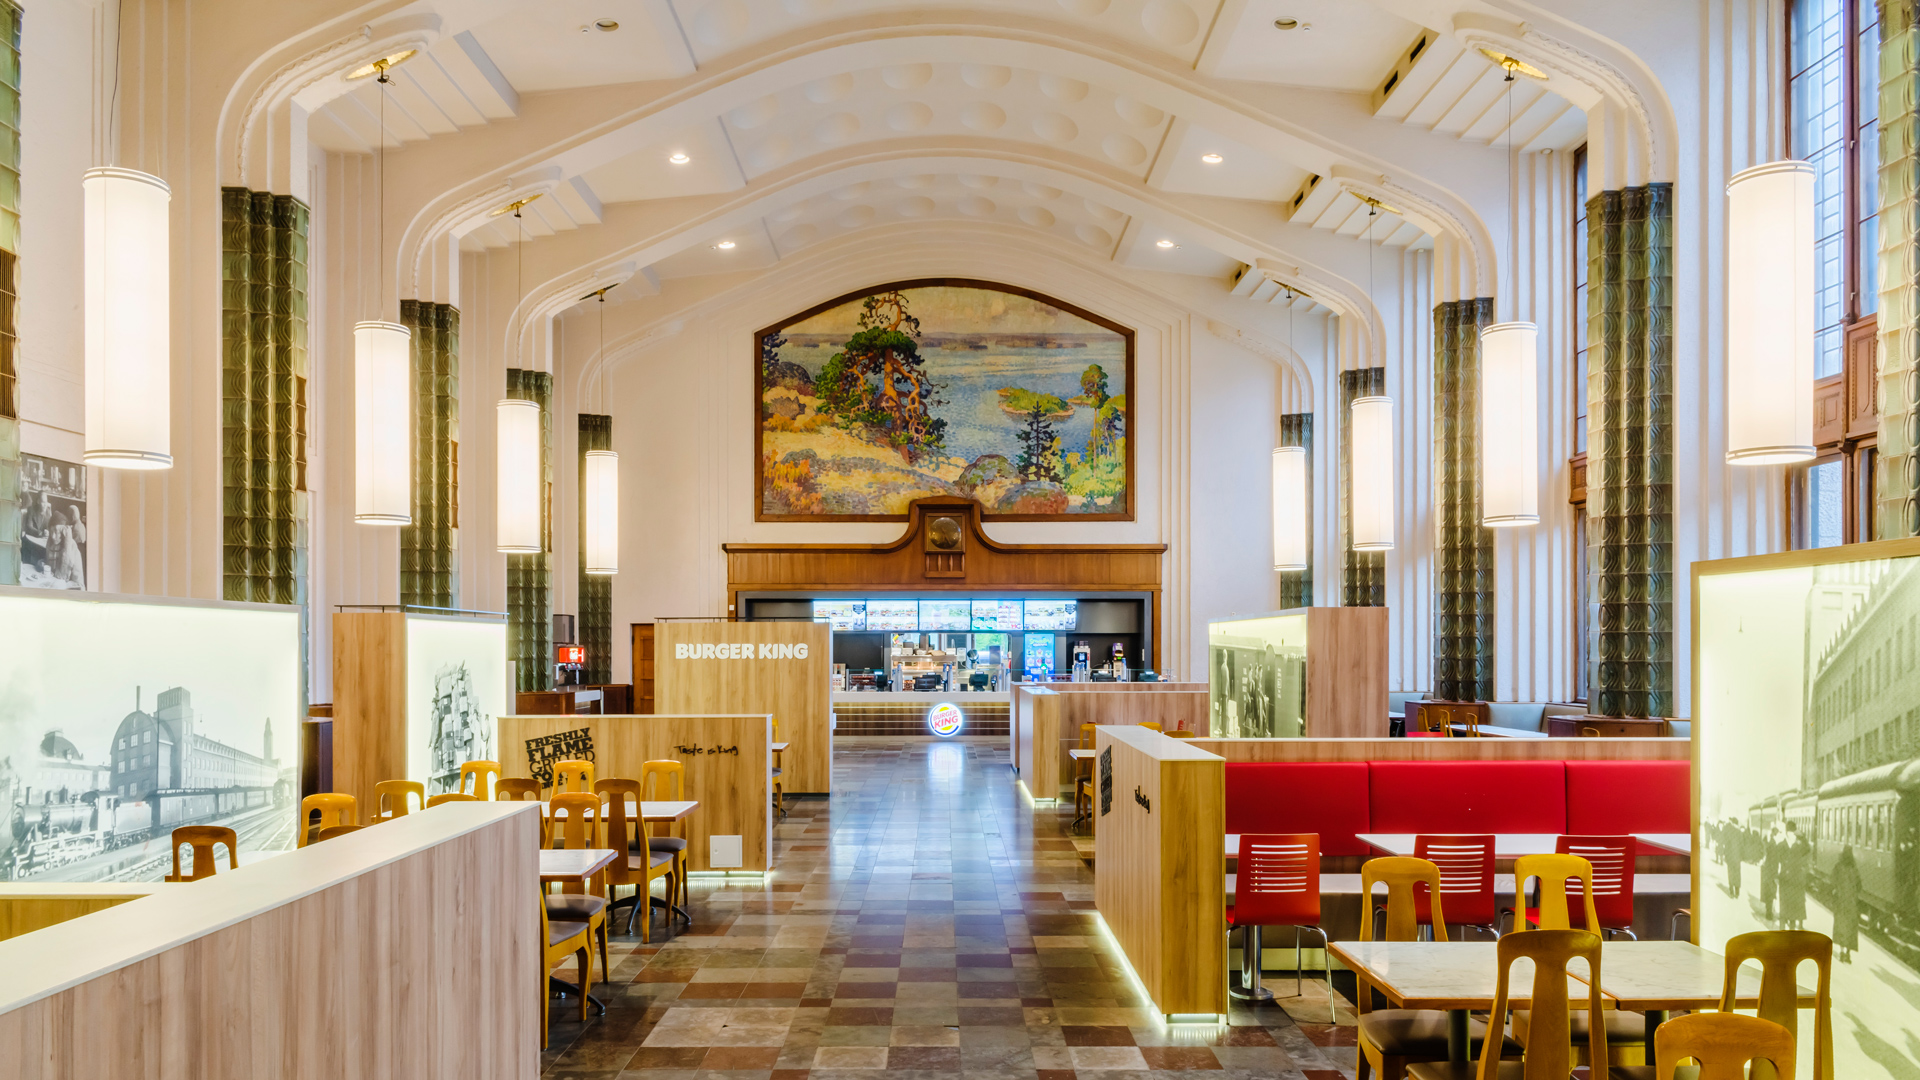 Burger_King_Restaurant_Helsinki_GI_home_page